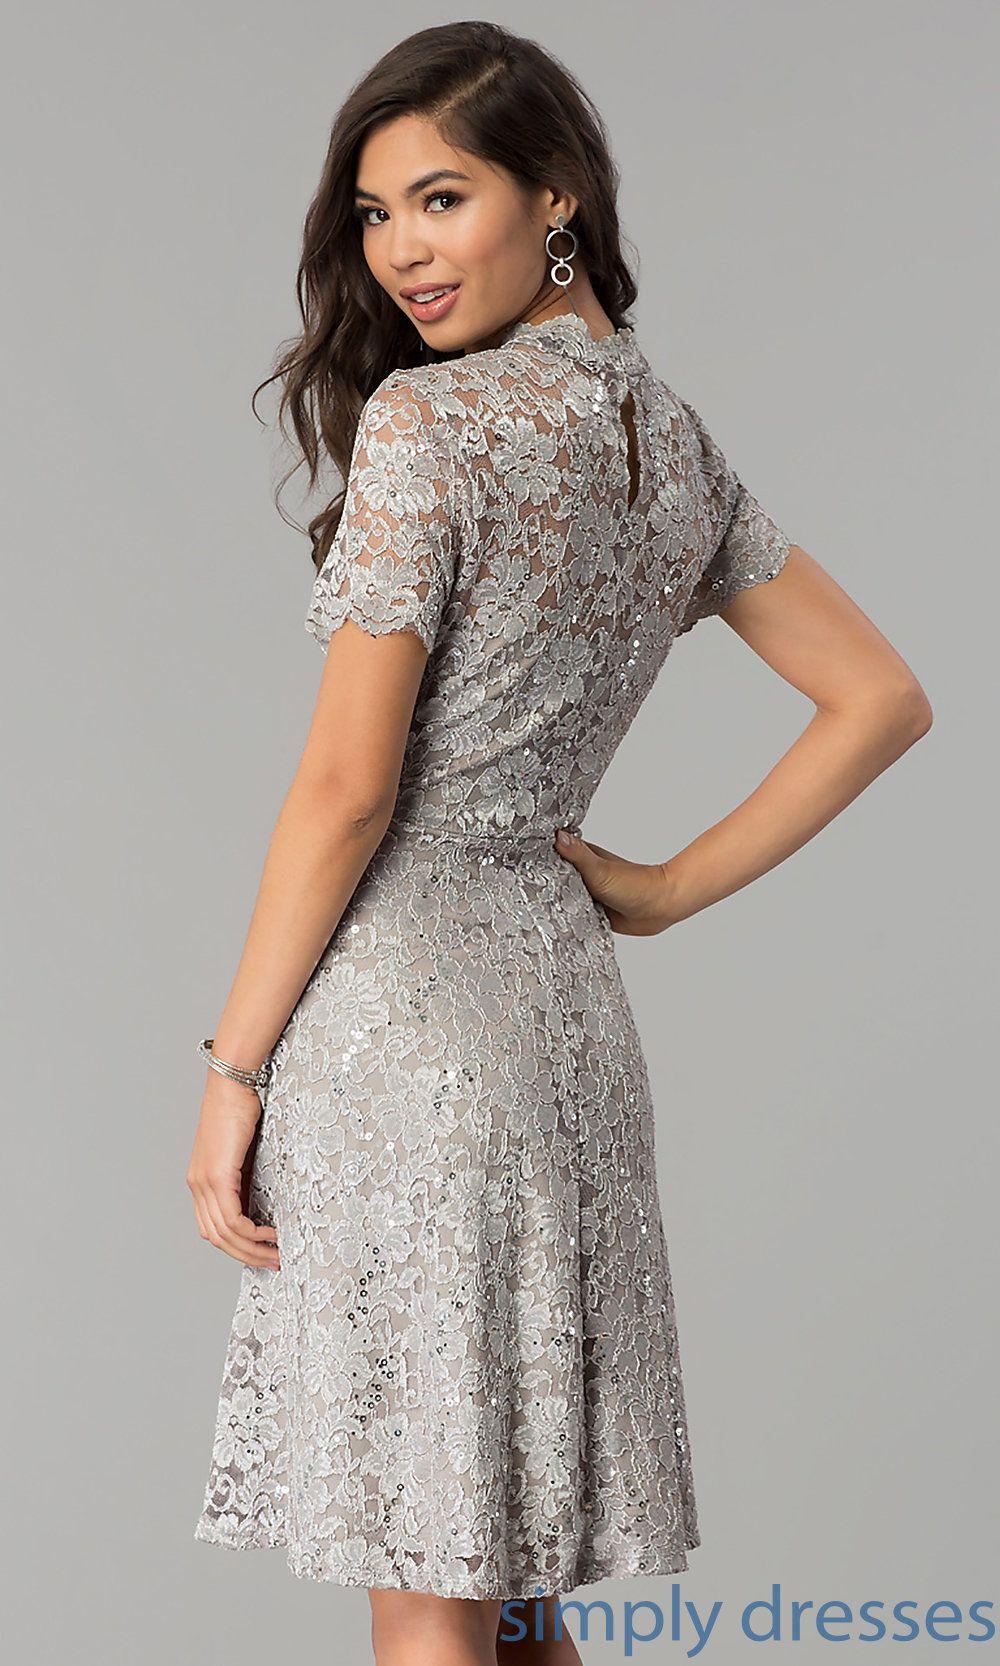 A Line High Neck Lace Wedding Guest Dress By Onyx Wedding Guest Dress Guest Dresses Lace Wedding Guest Dress [ 1666 x 1000 Pixel ]